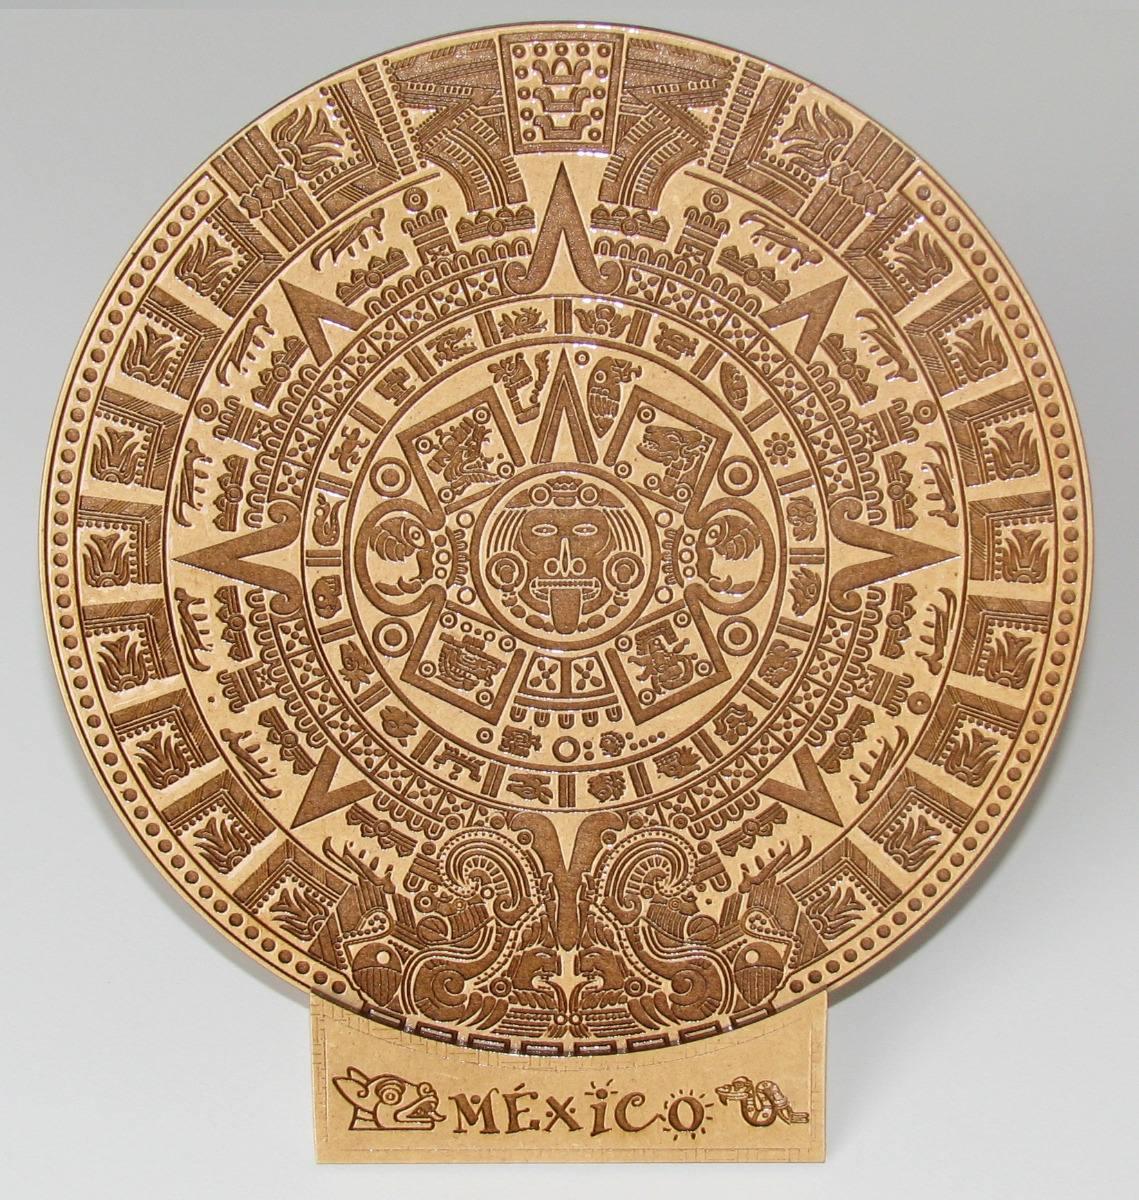 Calendario Azteca.Calendario Azteca De 20 Cm Grabado